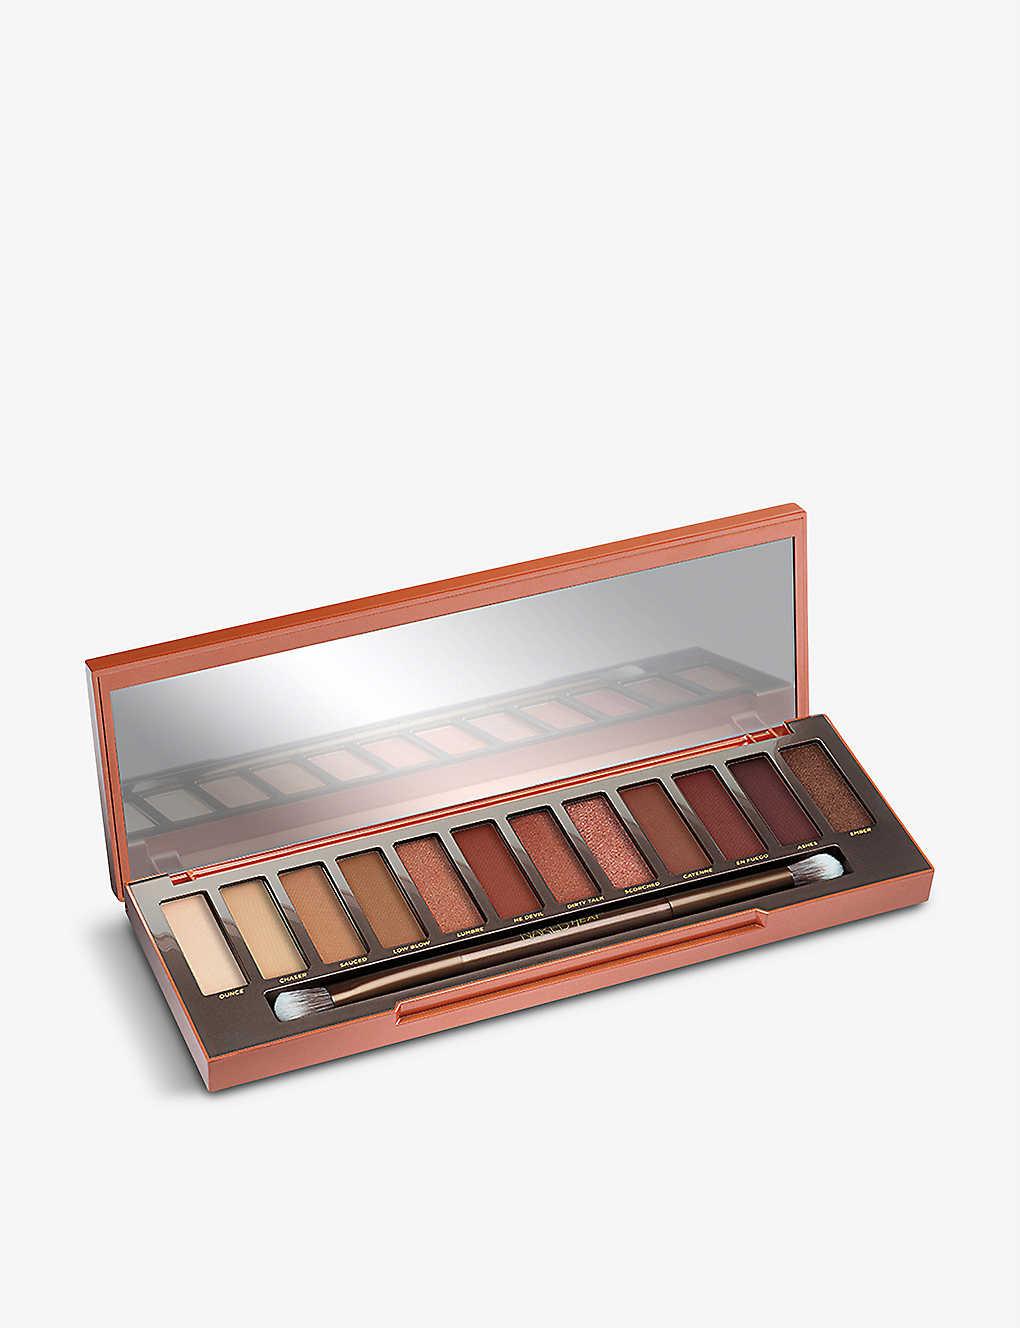 URBAN DECAY: Naked Heat Eyeshadow Palette